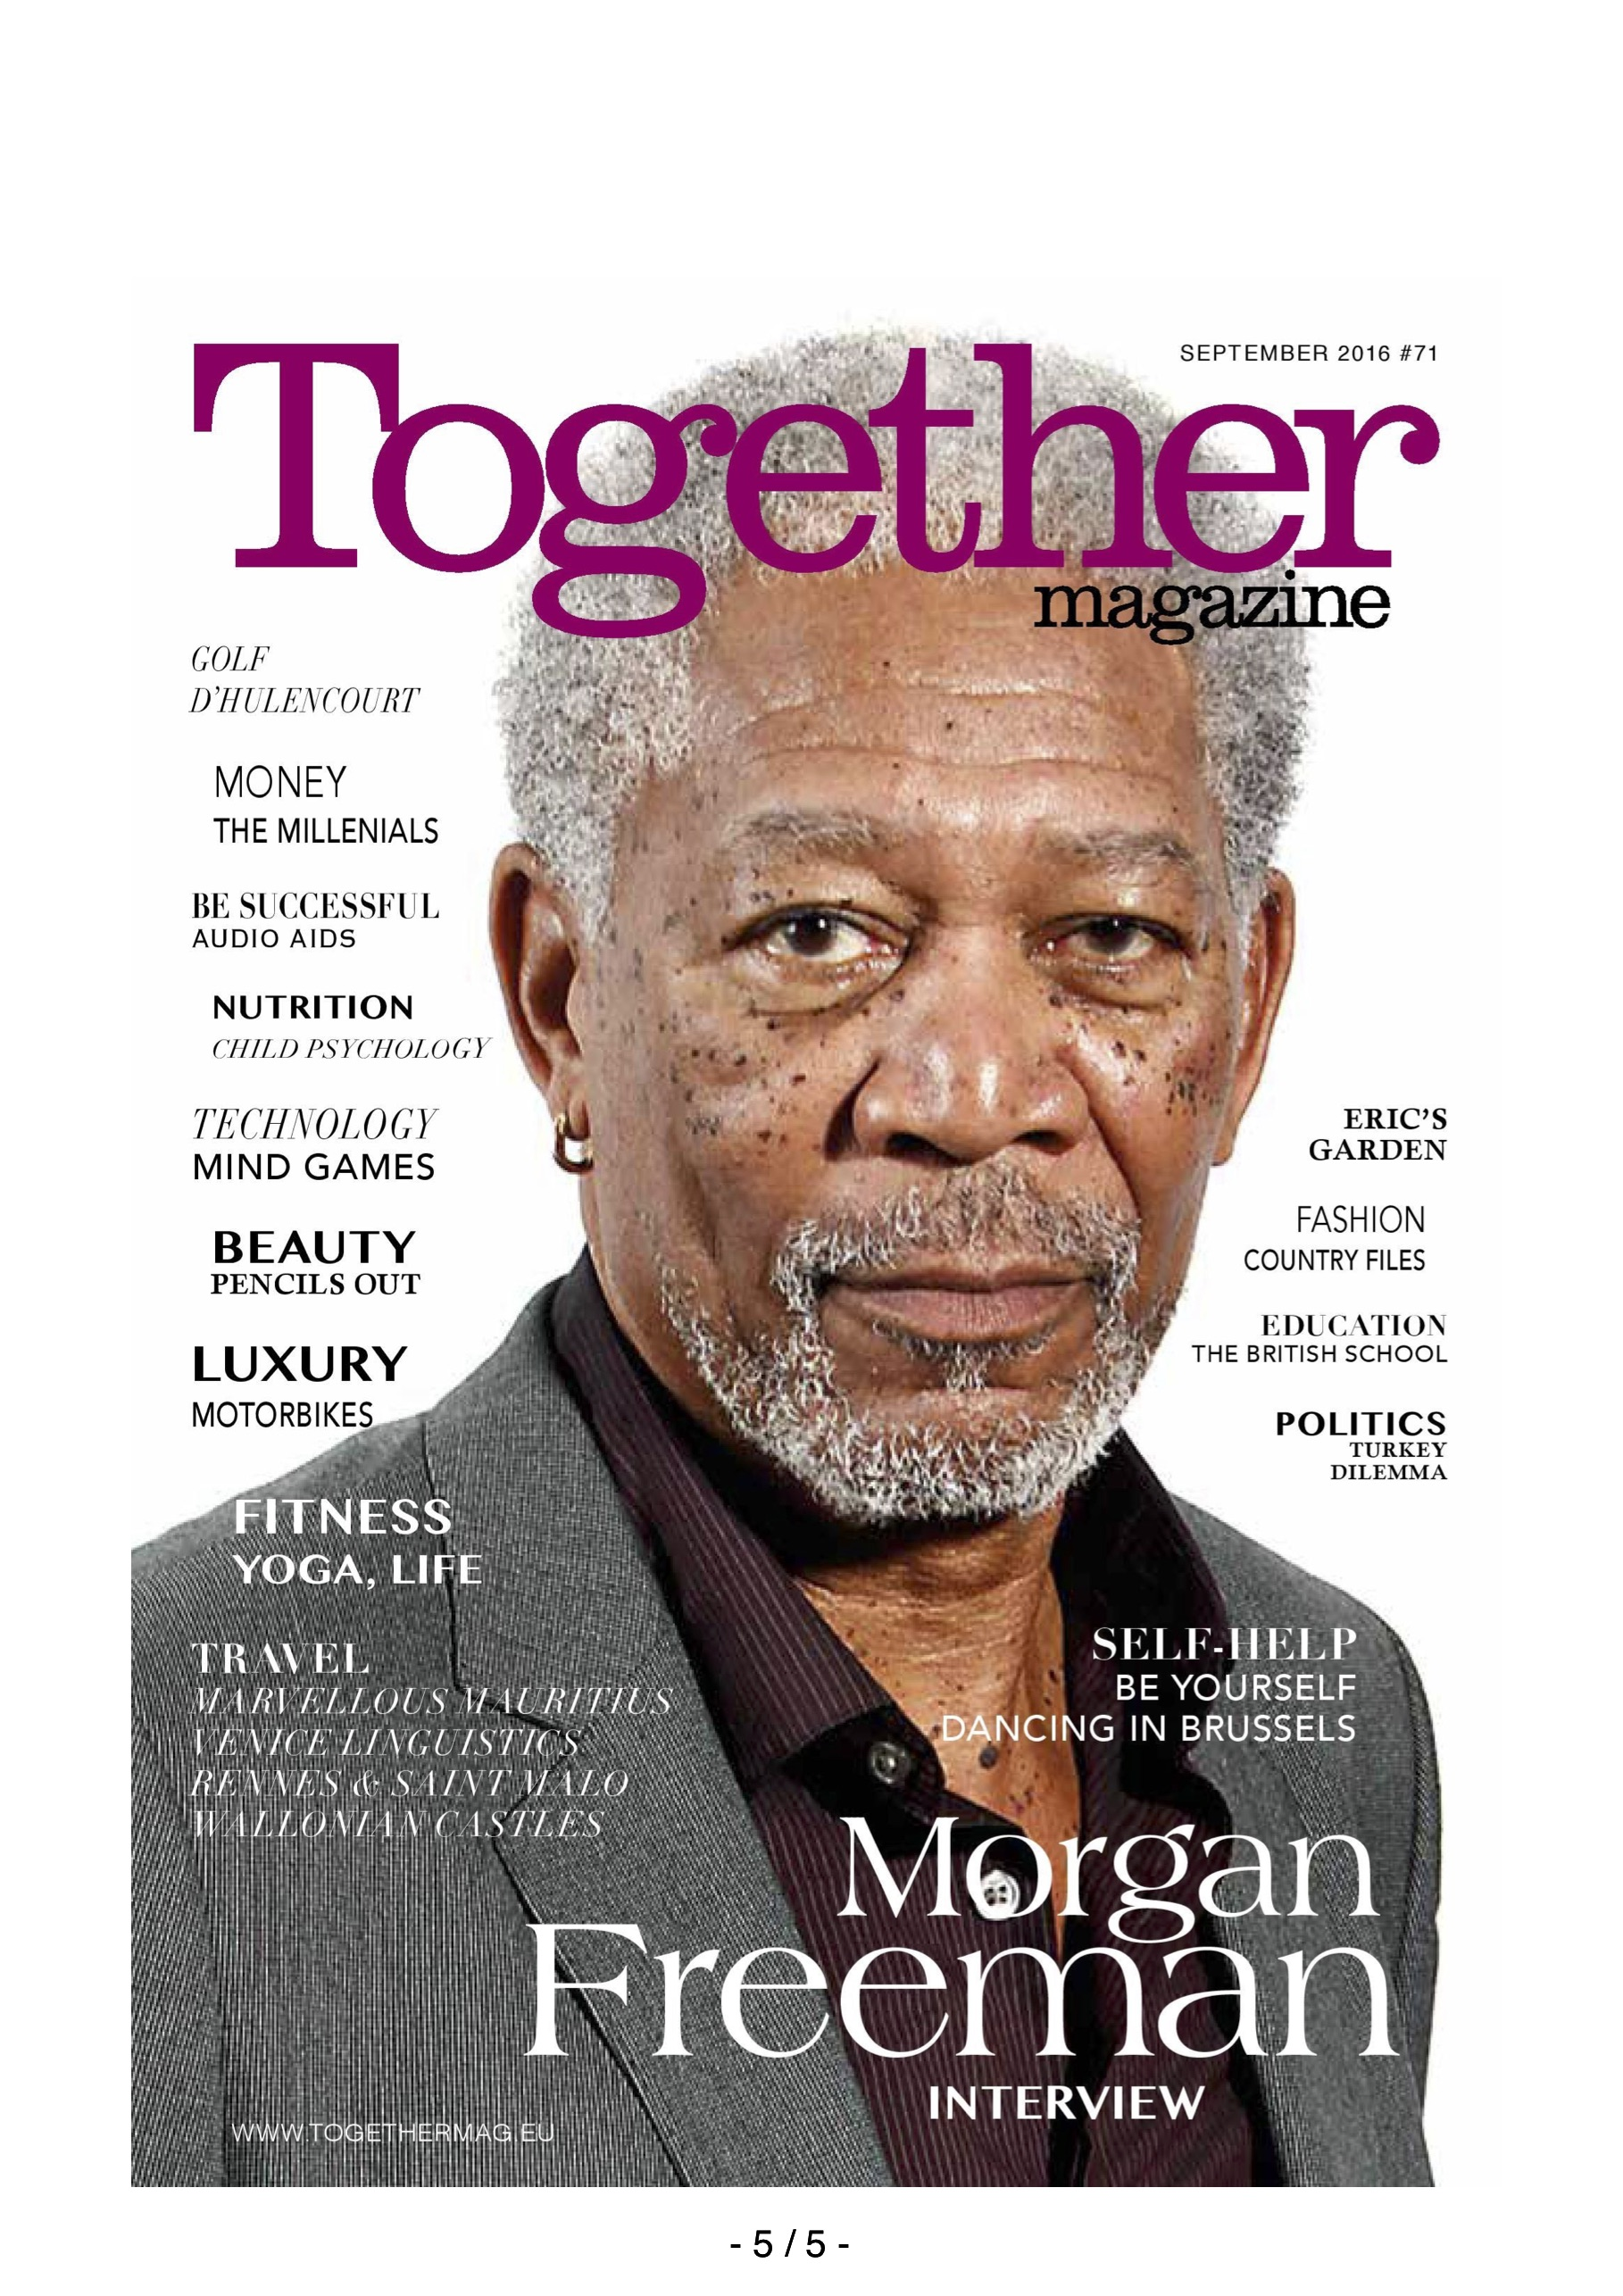 MaisonArmandJonckers_TogetherMagazine.jpg